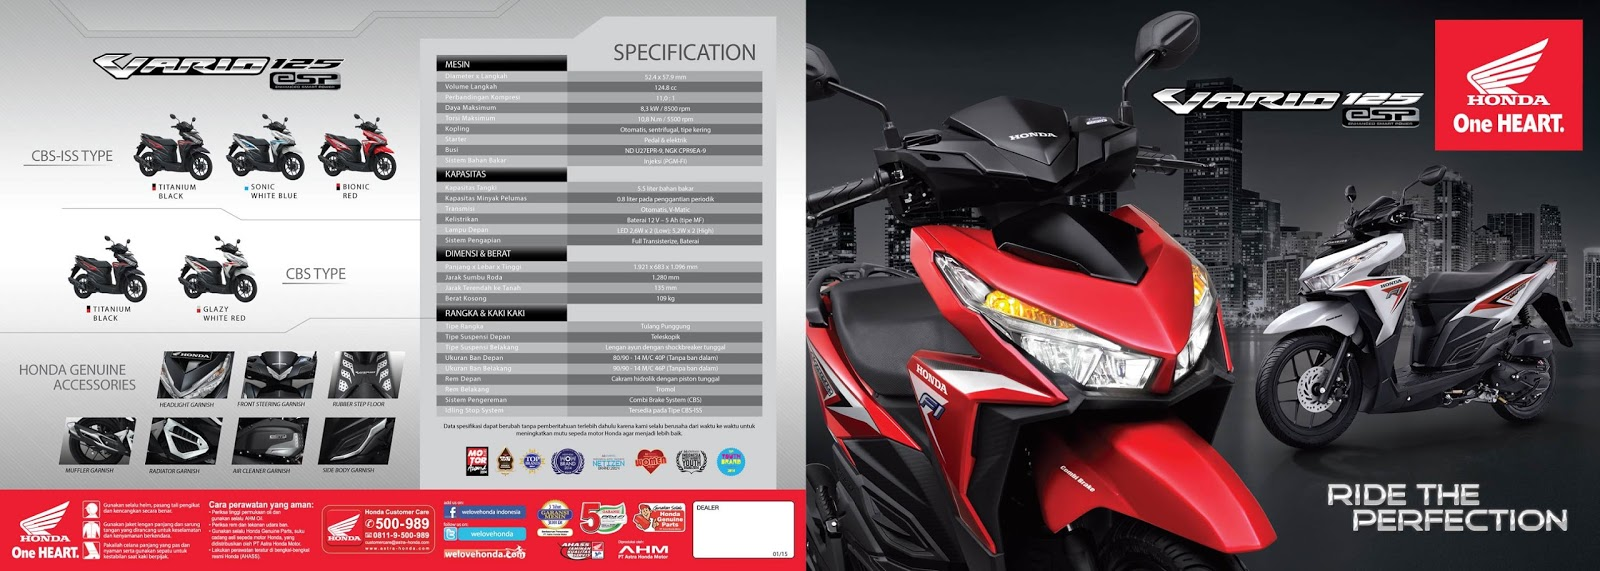 Cover Motor Vario 125 Esp Cbs Exclusive Black Update Daftar Harga All New 150 Matte Blue Kebumen Brosur Honda